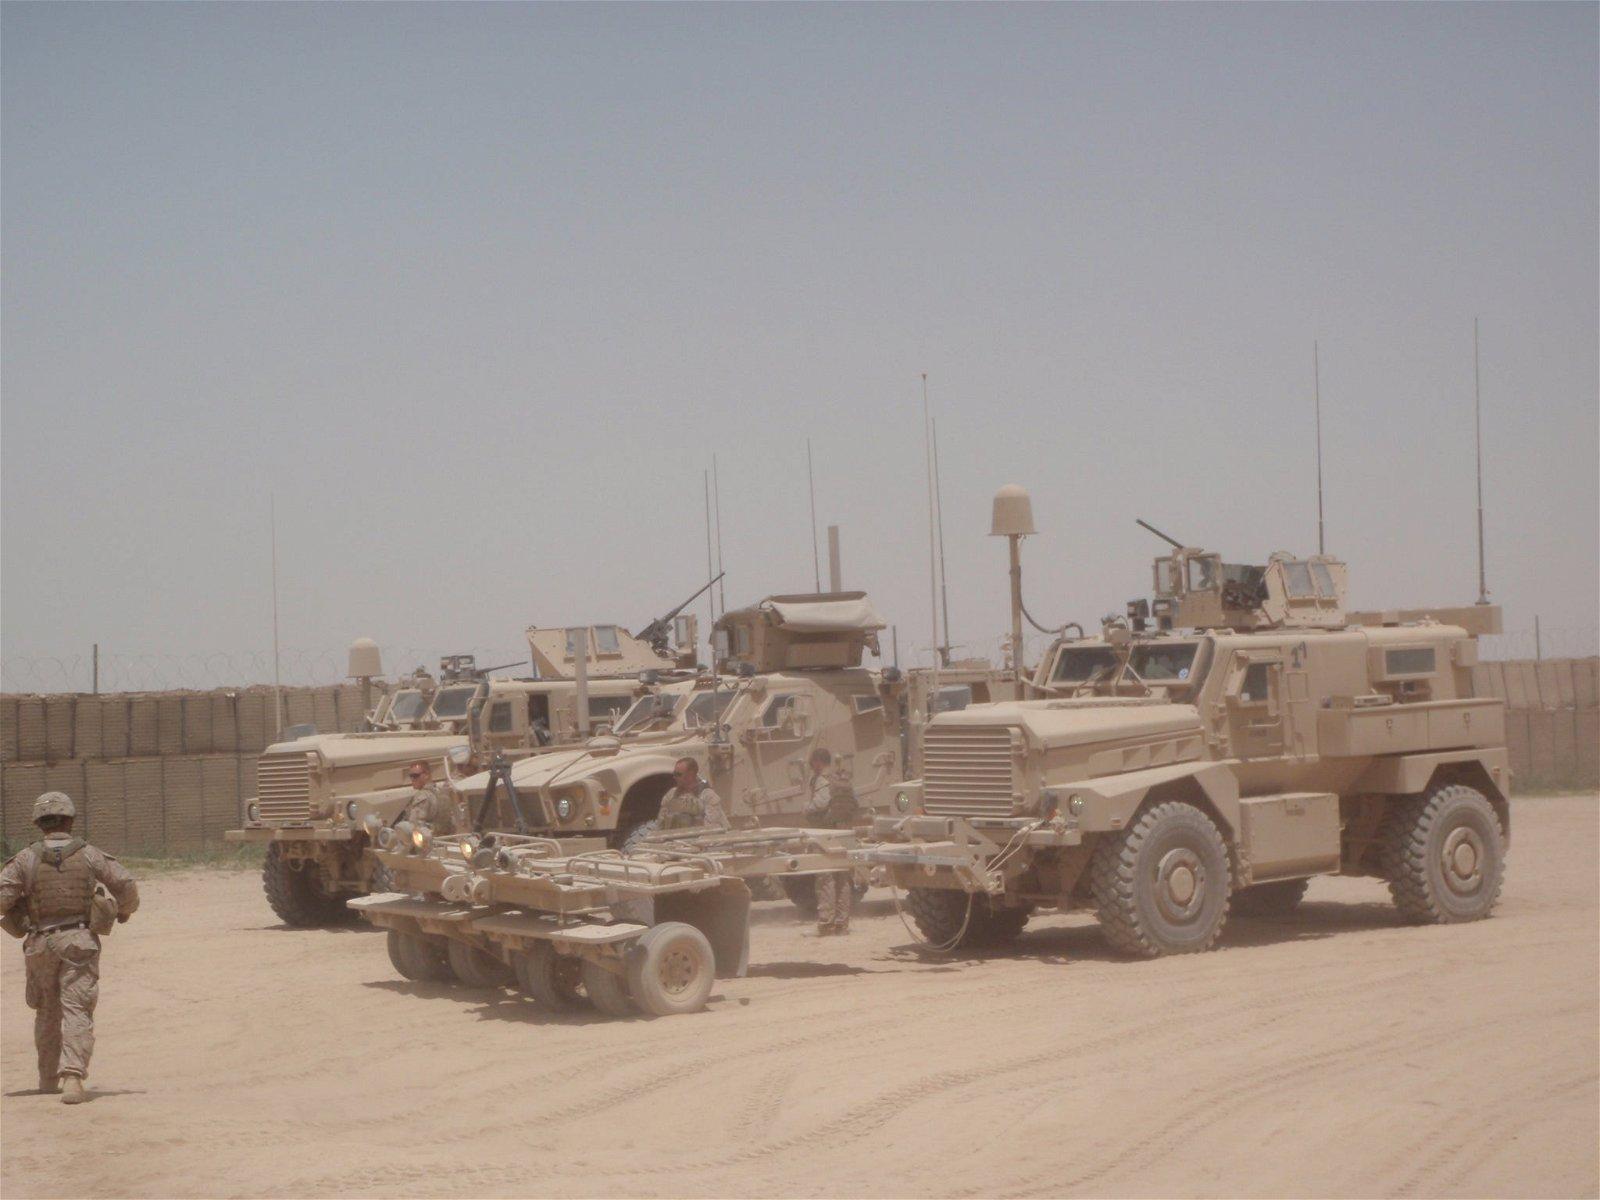 Iraq War Exposure Attorneys